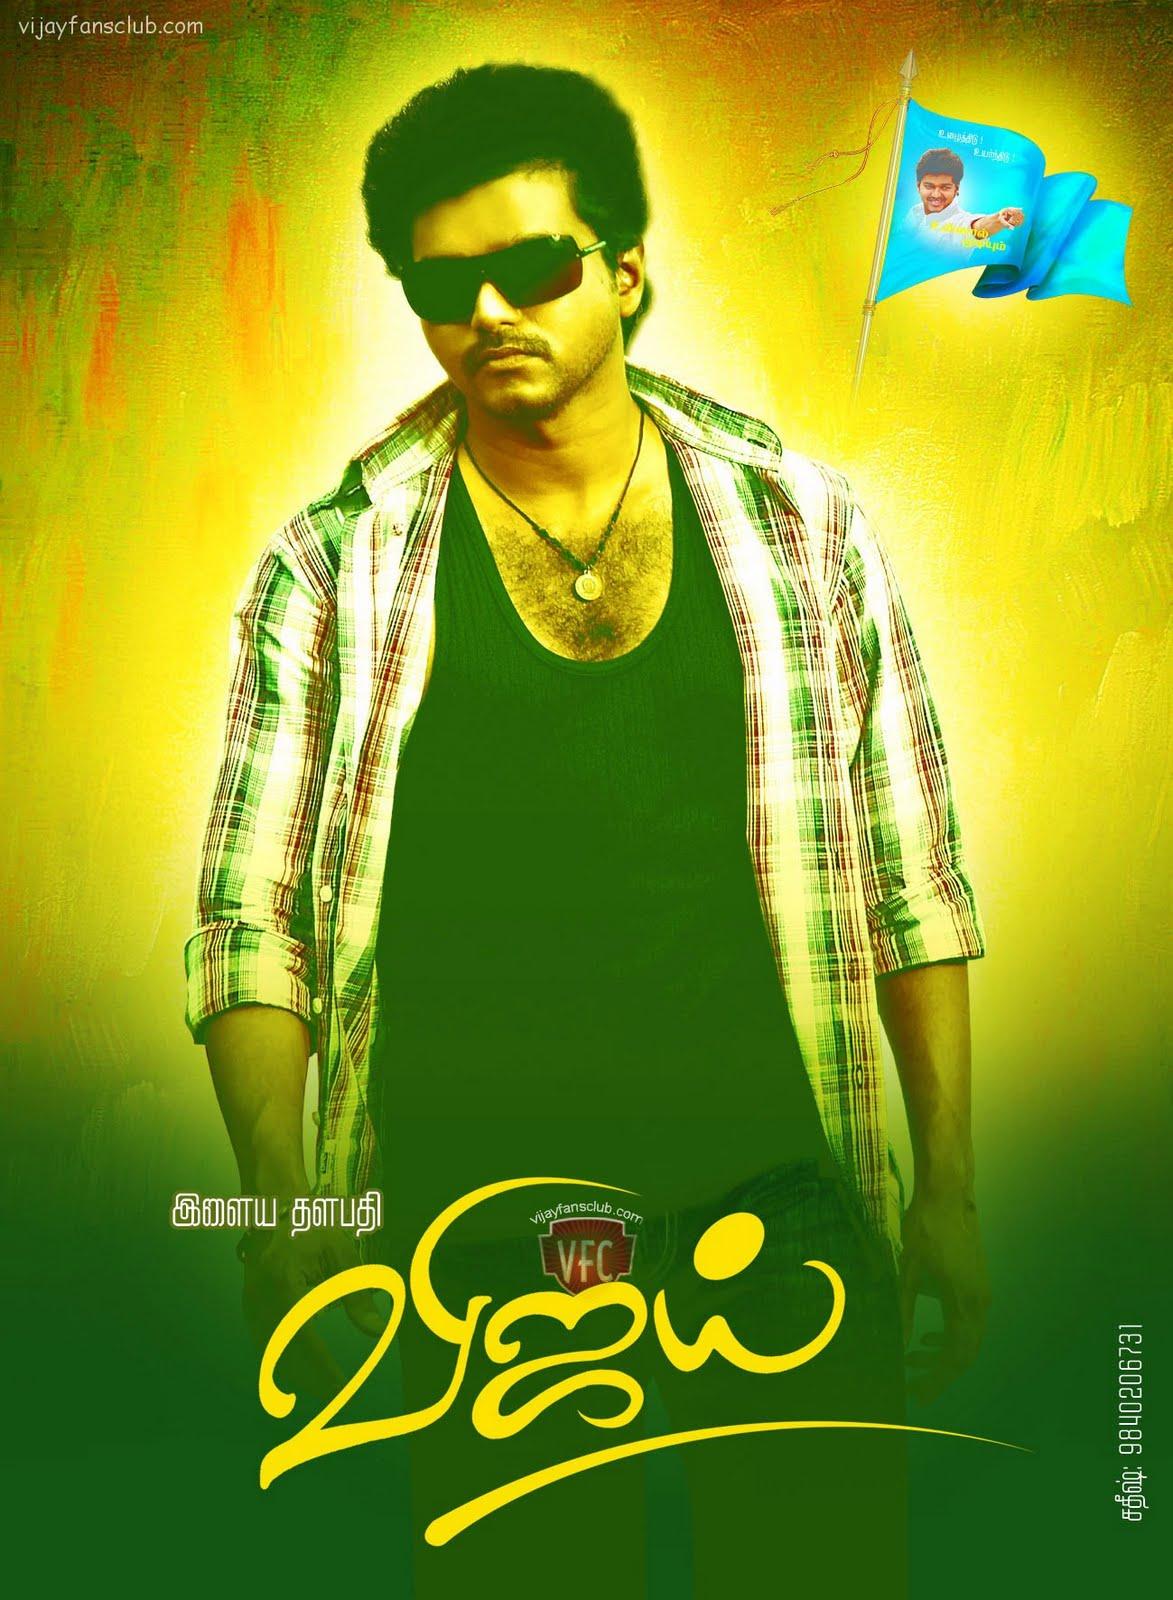 Tamil film wallpapers free download